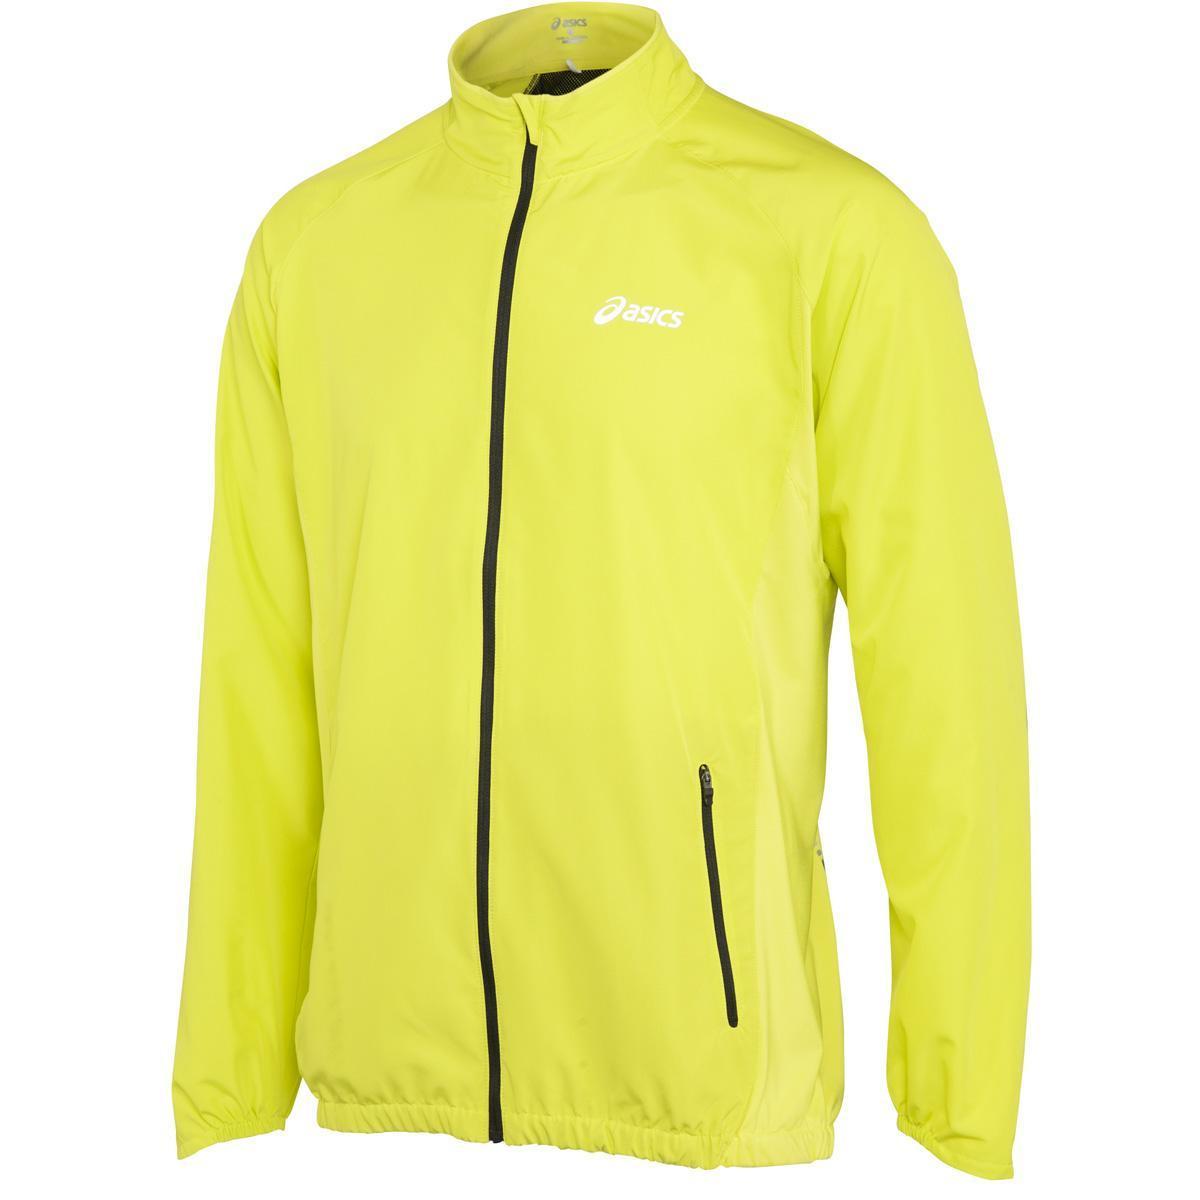 asics yellow running jacket